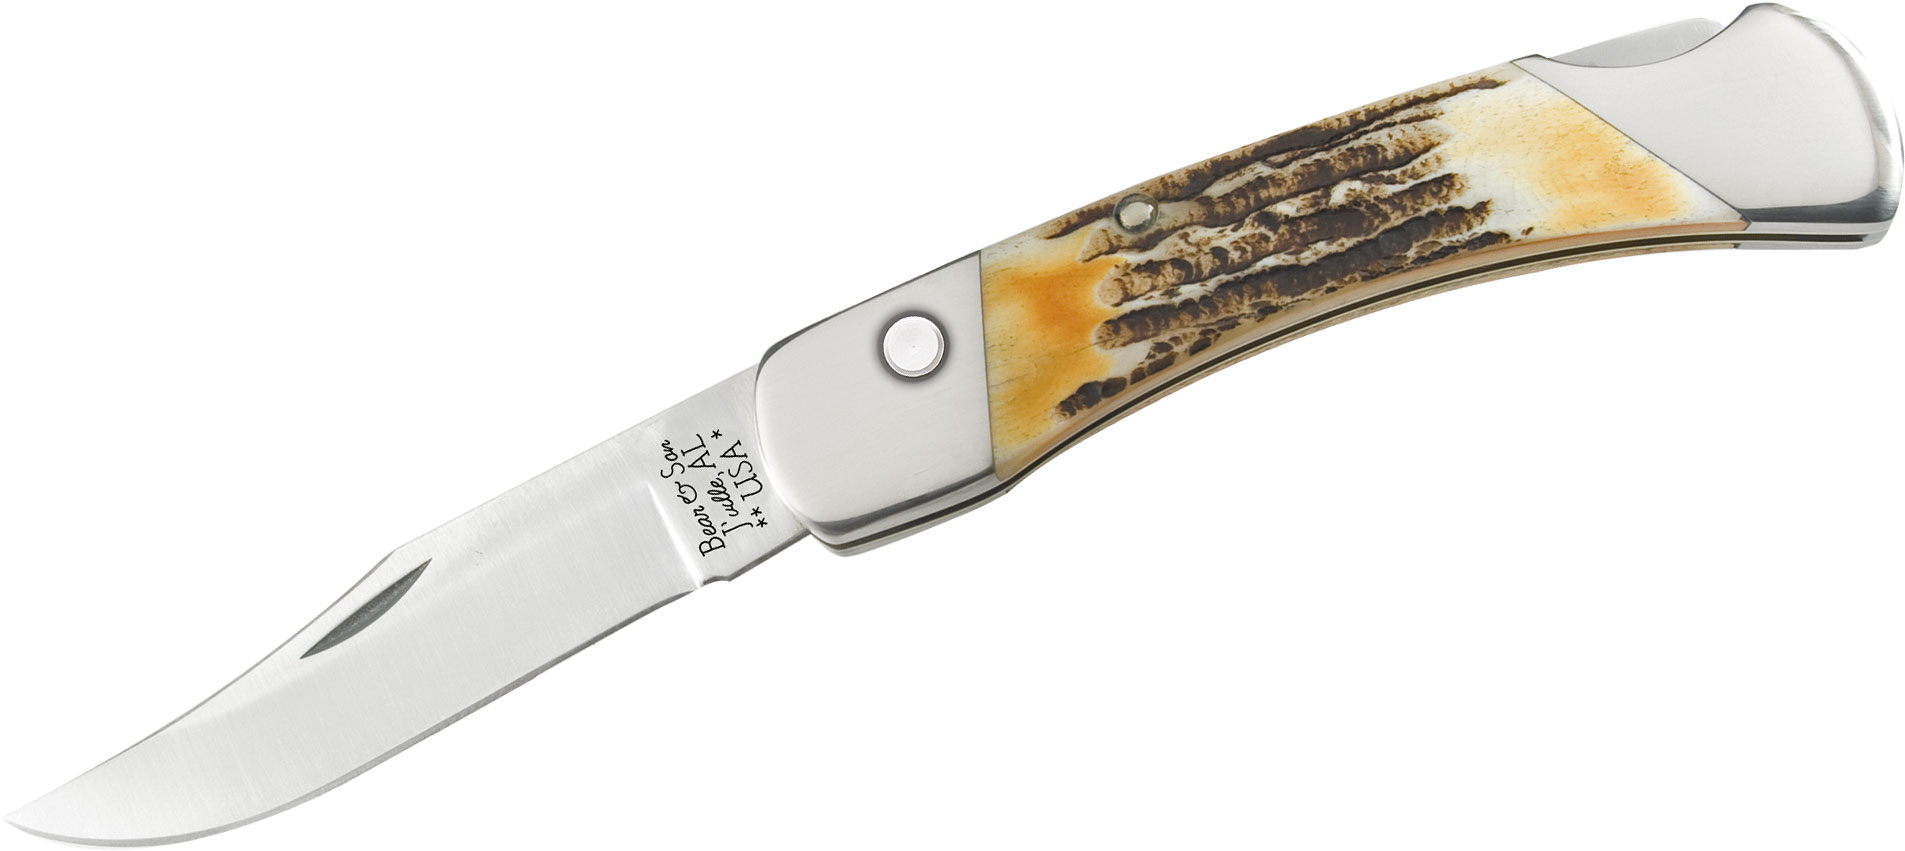 Bear & Son 5A97 Automatic Lockback Folding Knife 5 inch Closed, Genuine India Stag Bone Handles